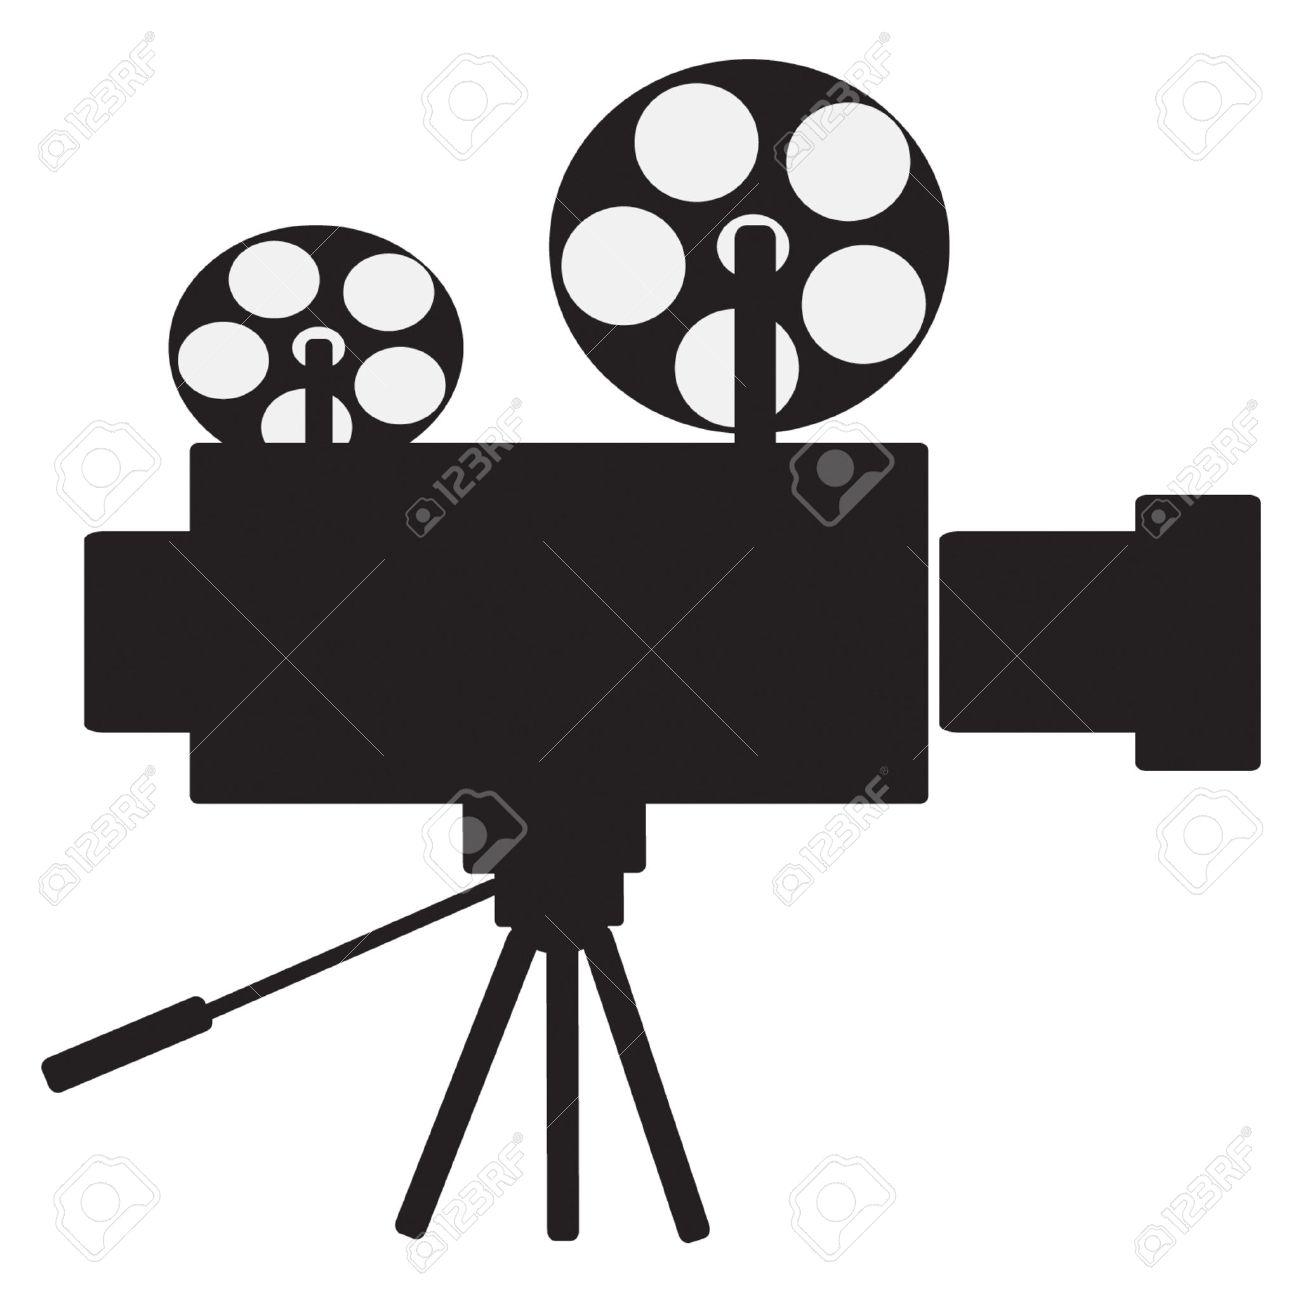 Film Projector Vector Clip Art Royalty Free Cliparts, Vectors, And ...